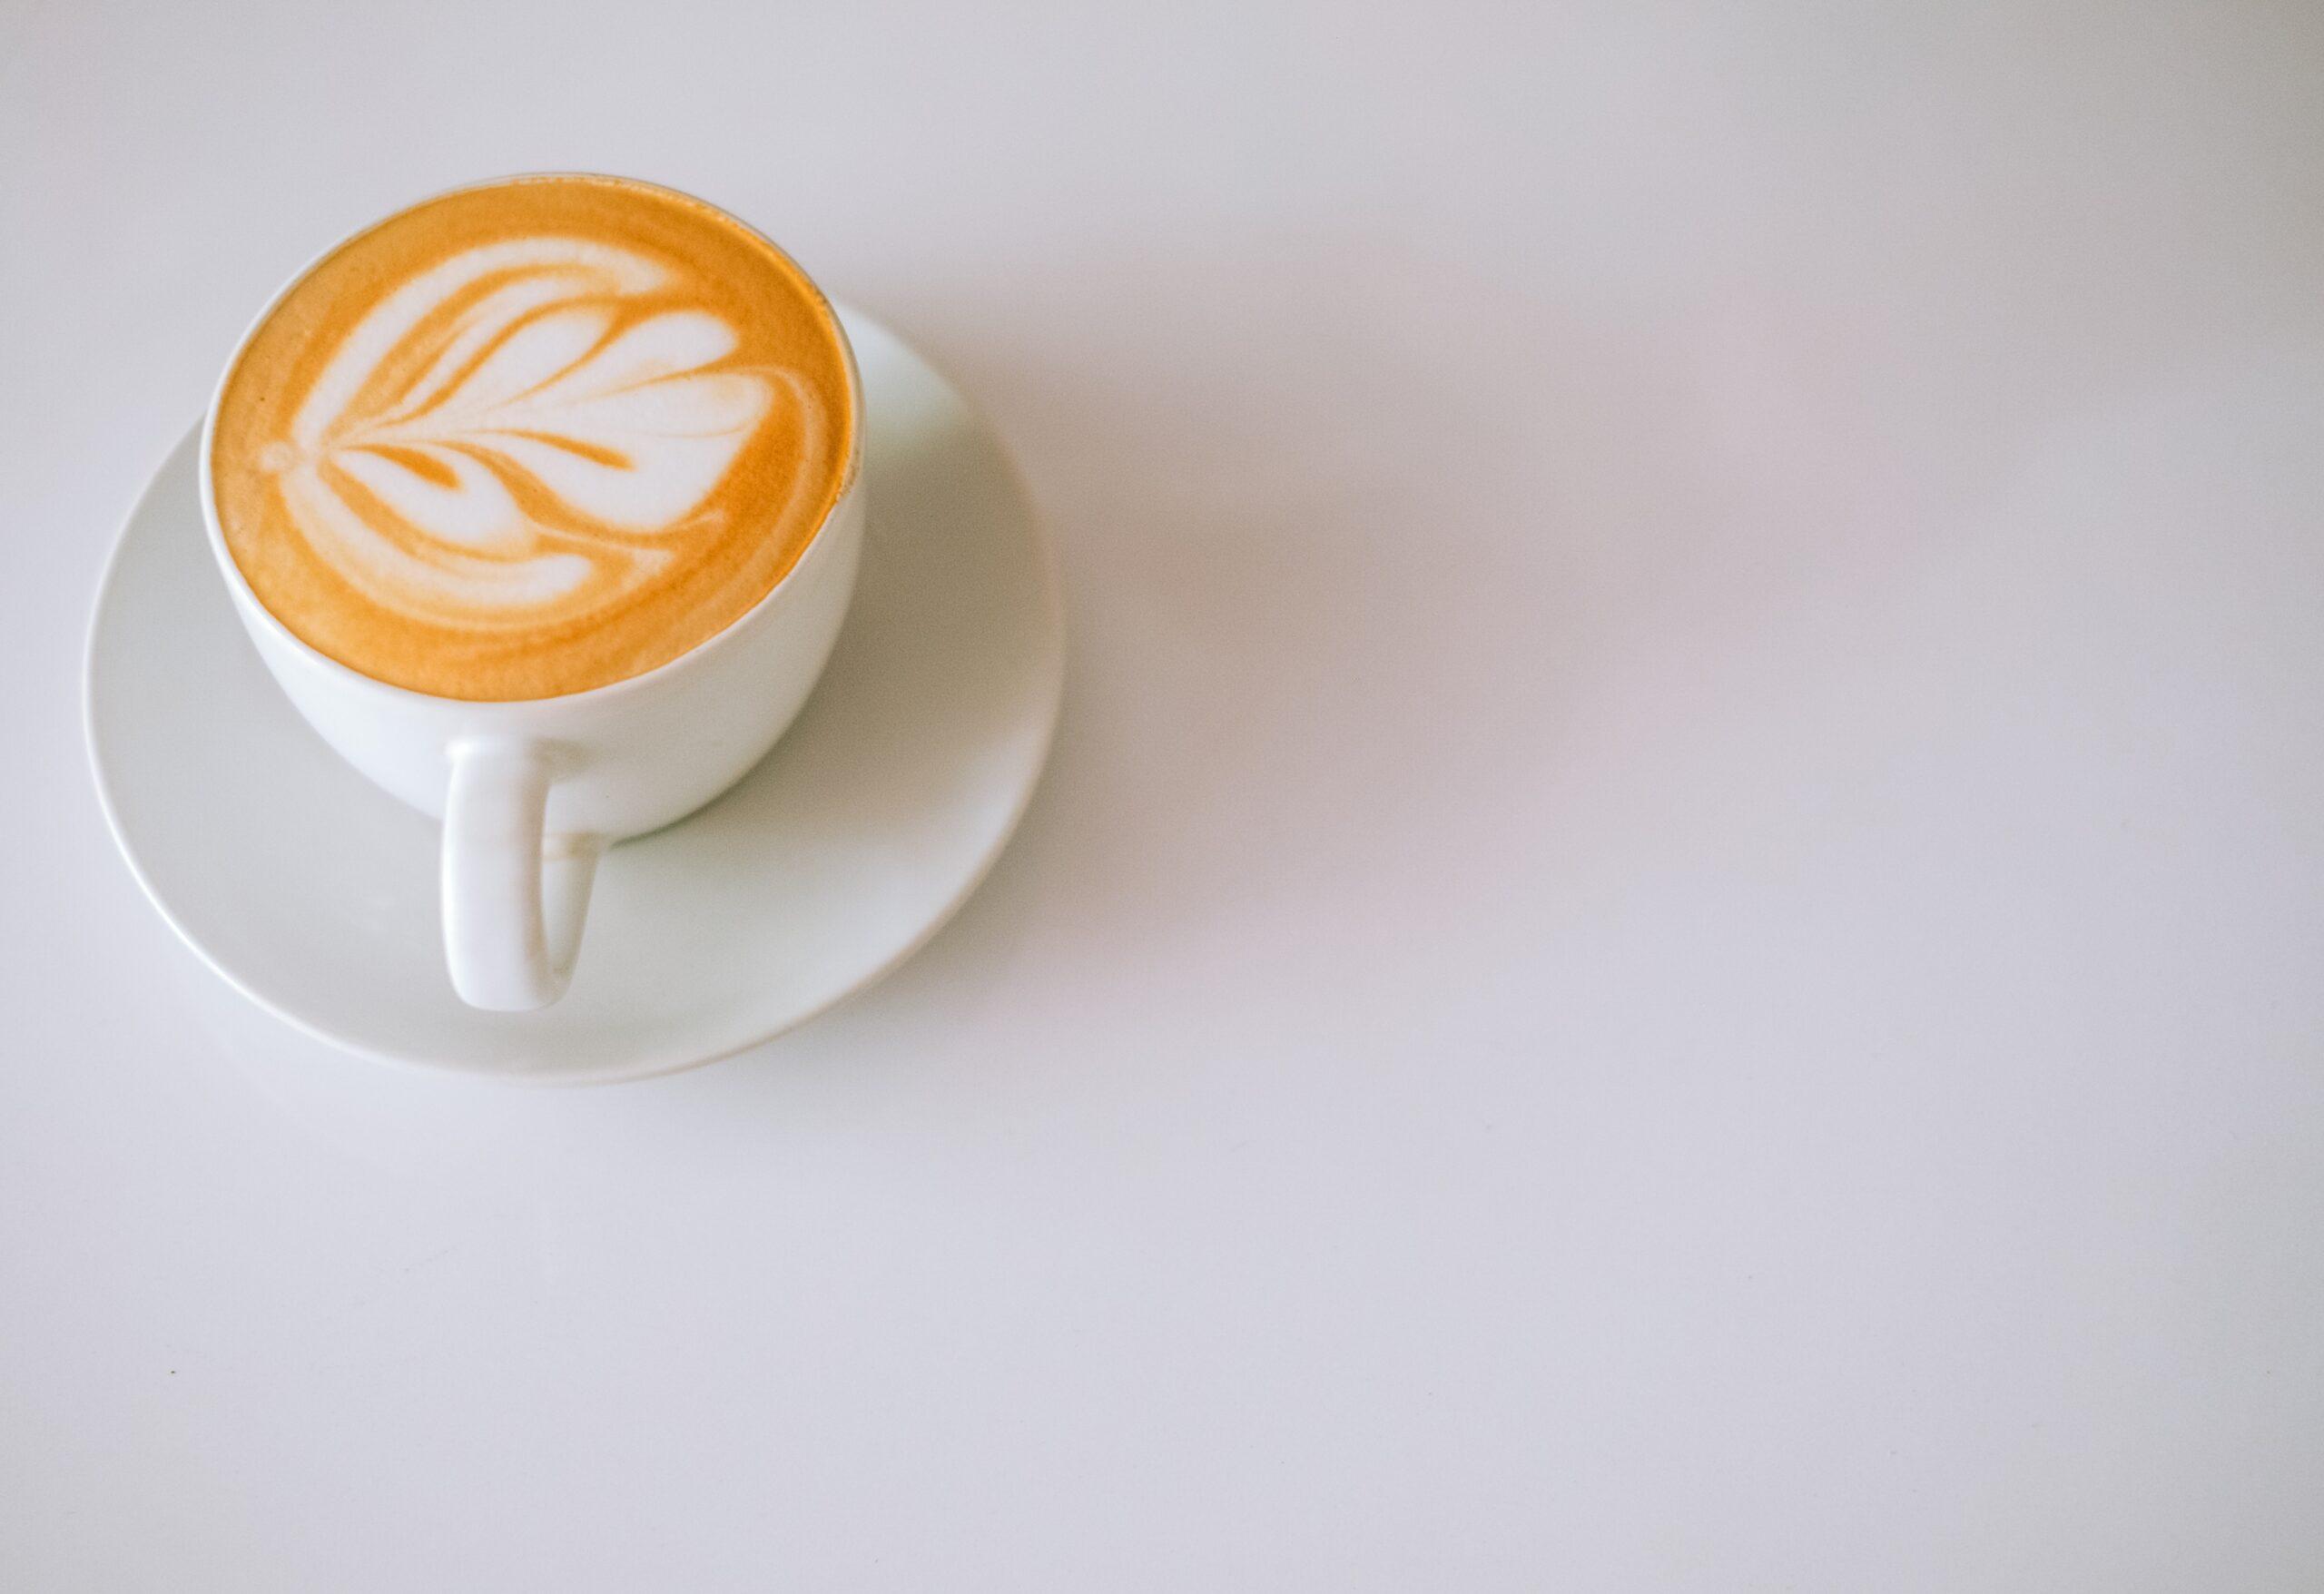 Pumpkin Spice Latte: Make at Home!